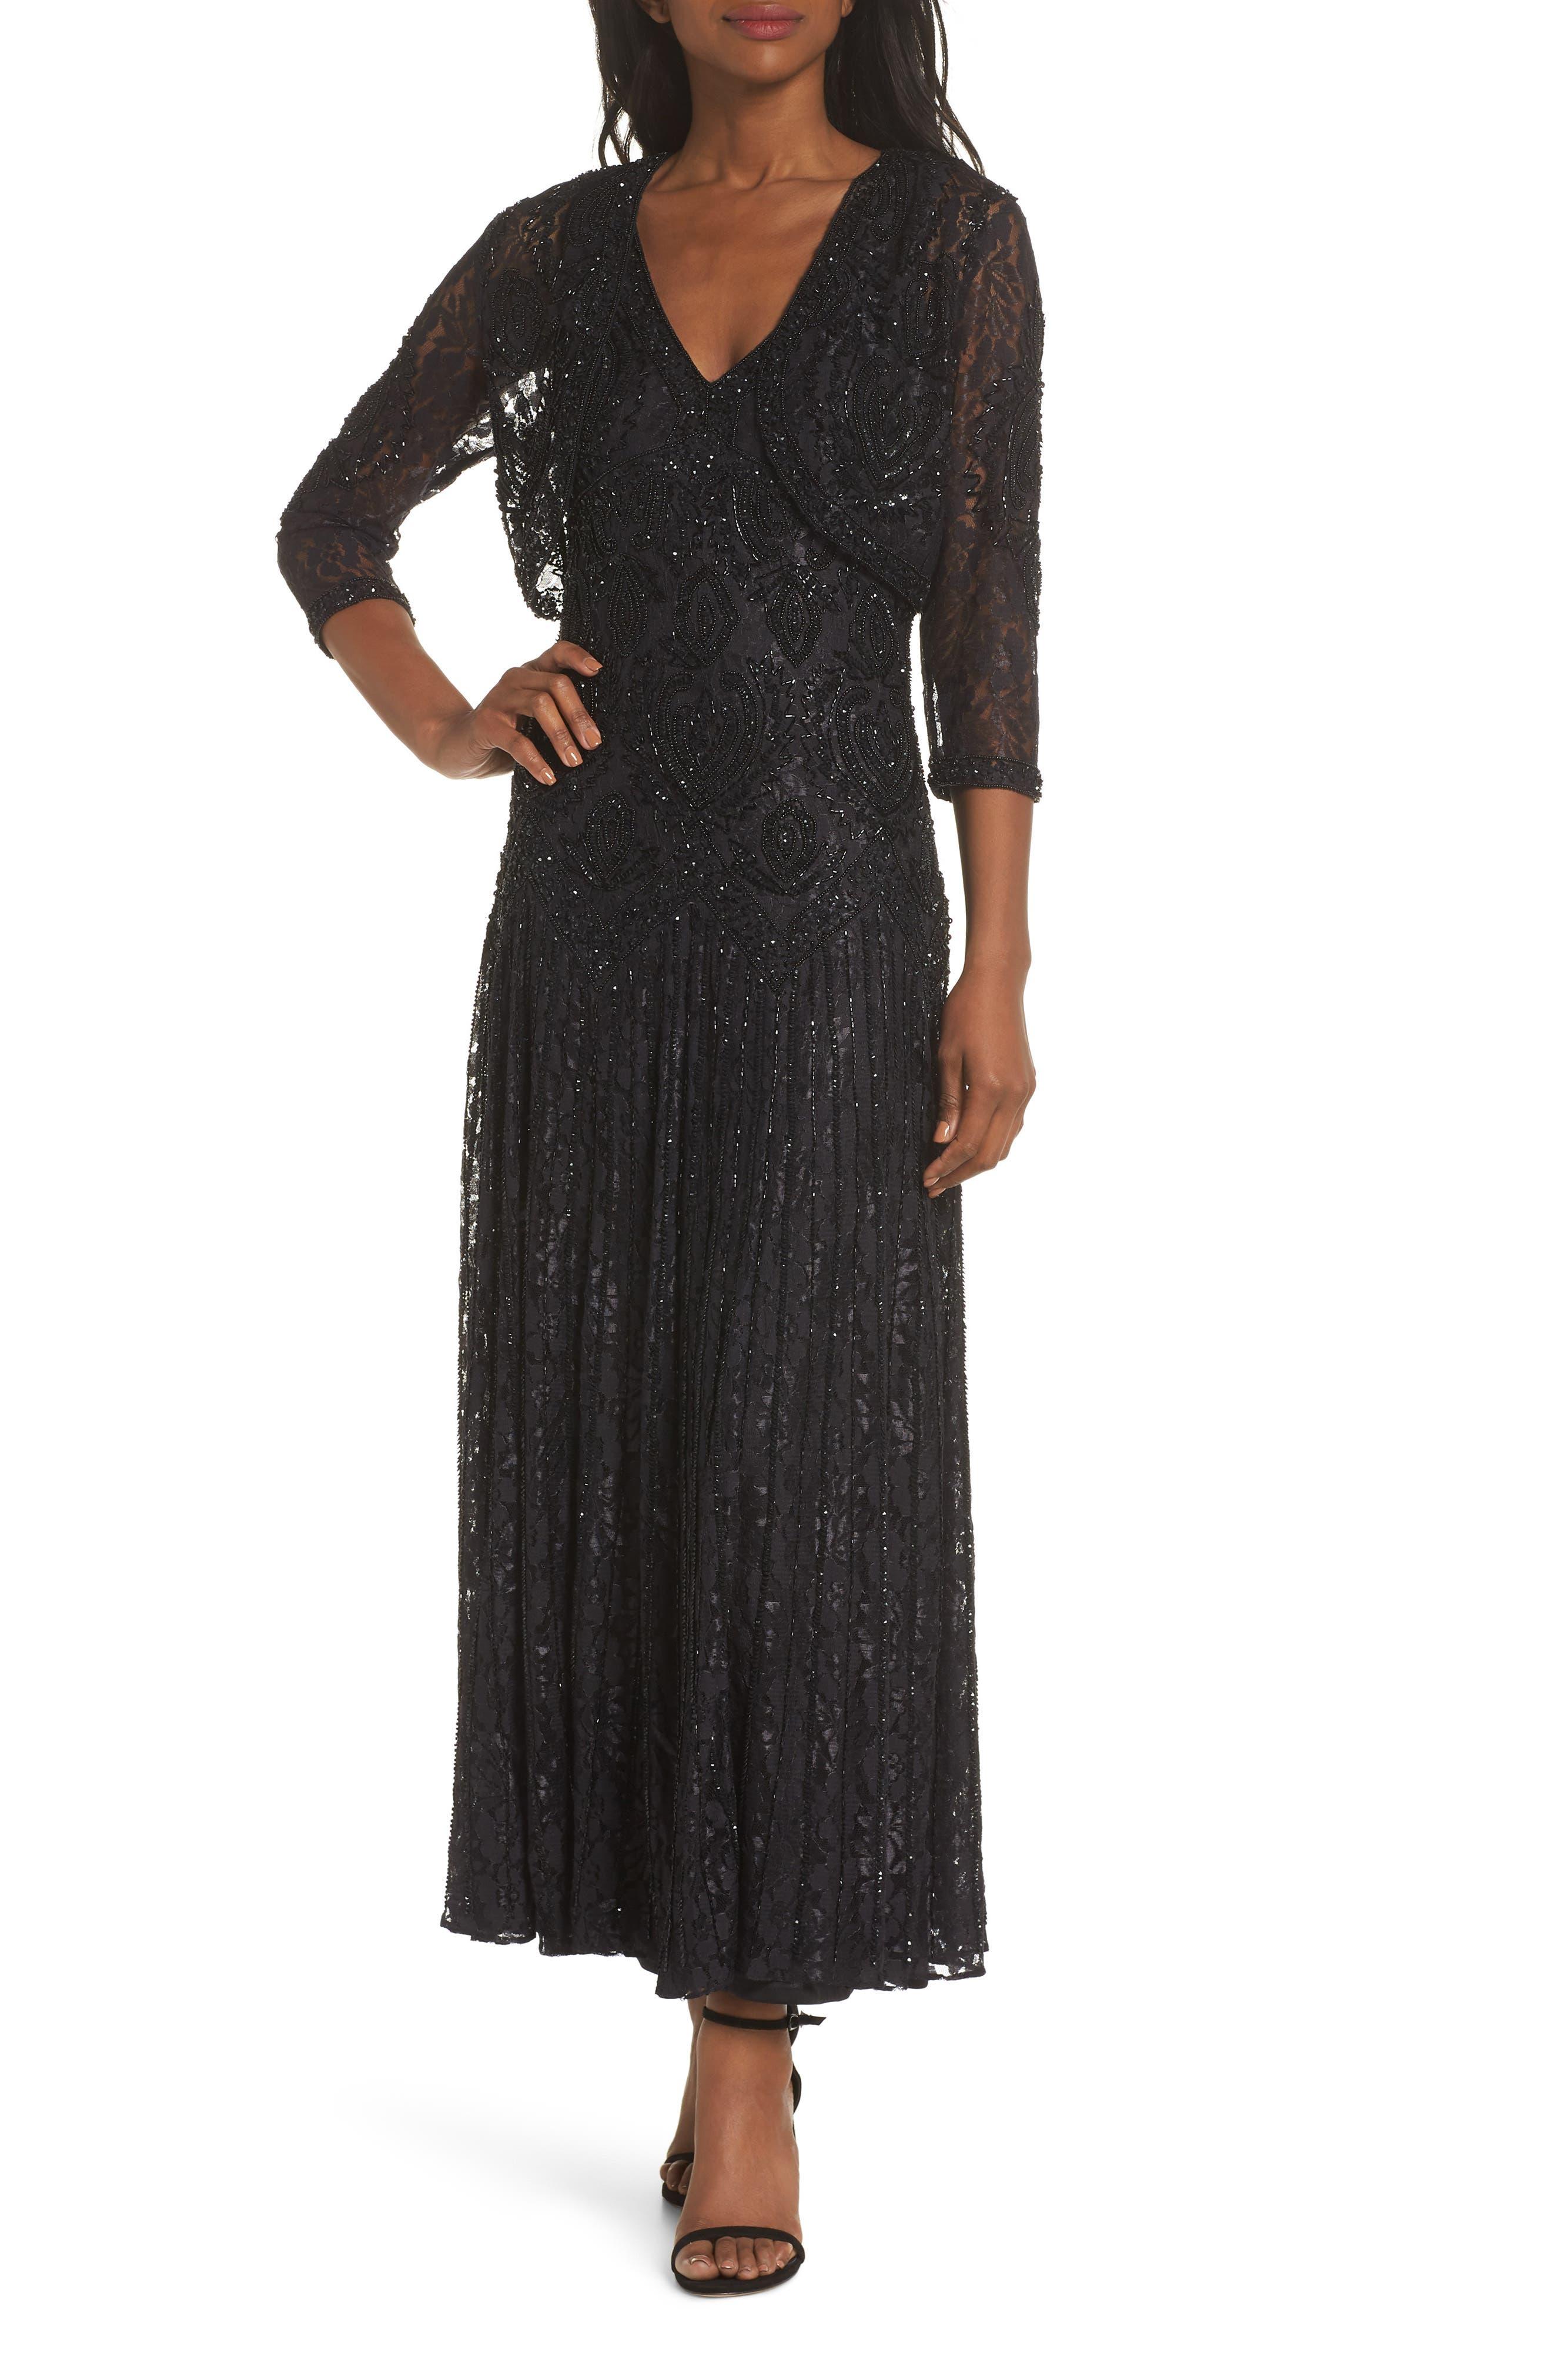 PISARRO NIGHTS Beaded Lace Evening Dress with Bolero, Main, color, BLACK